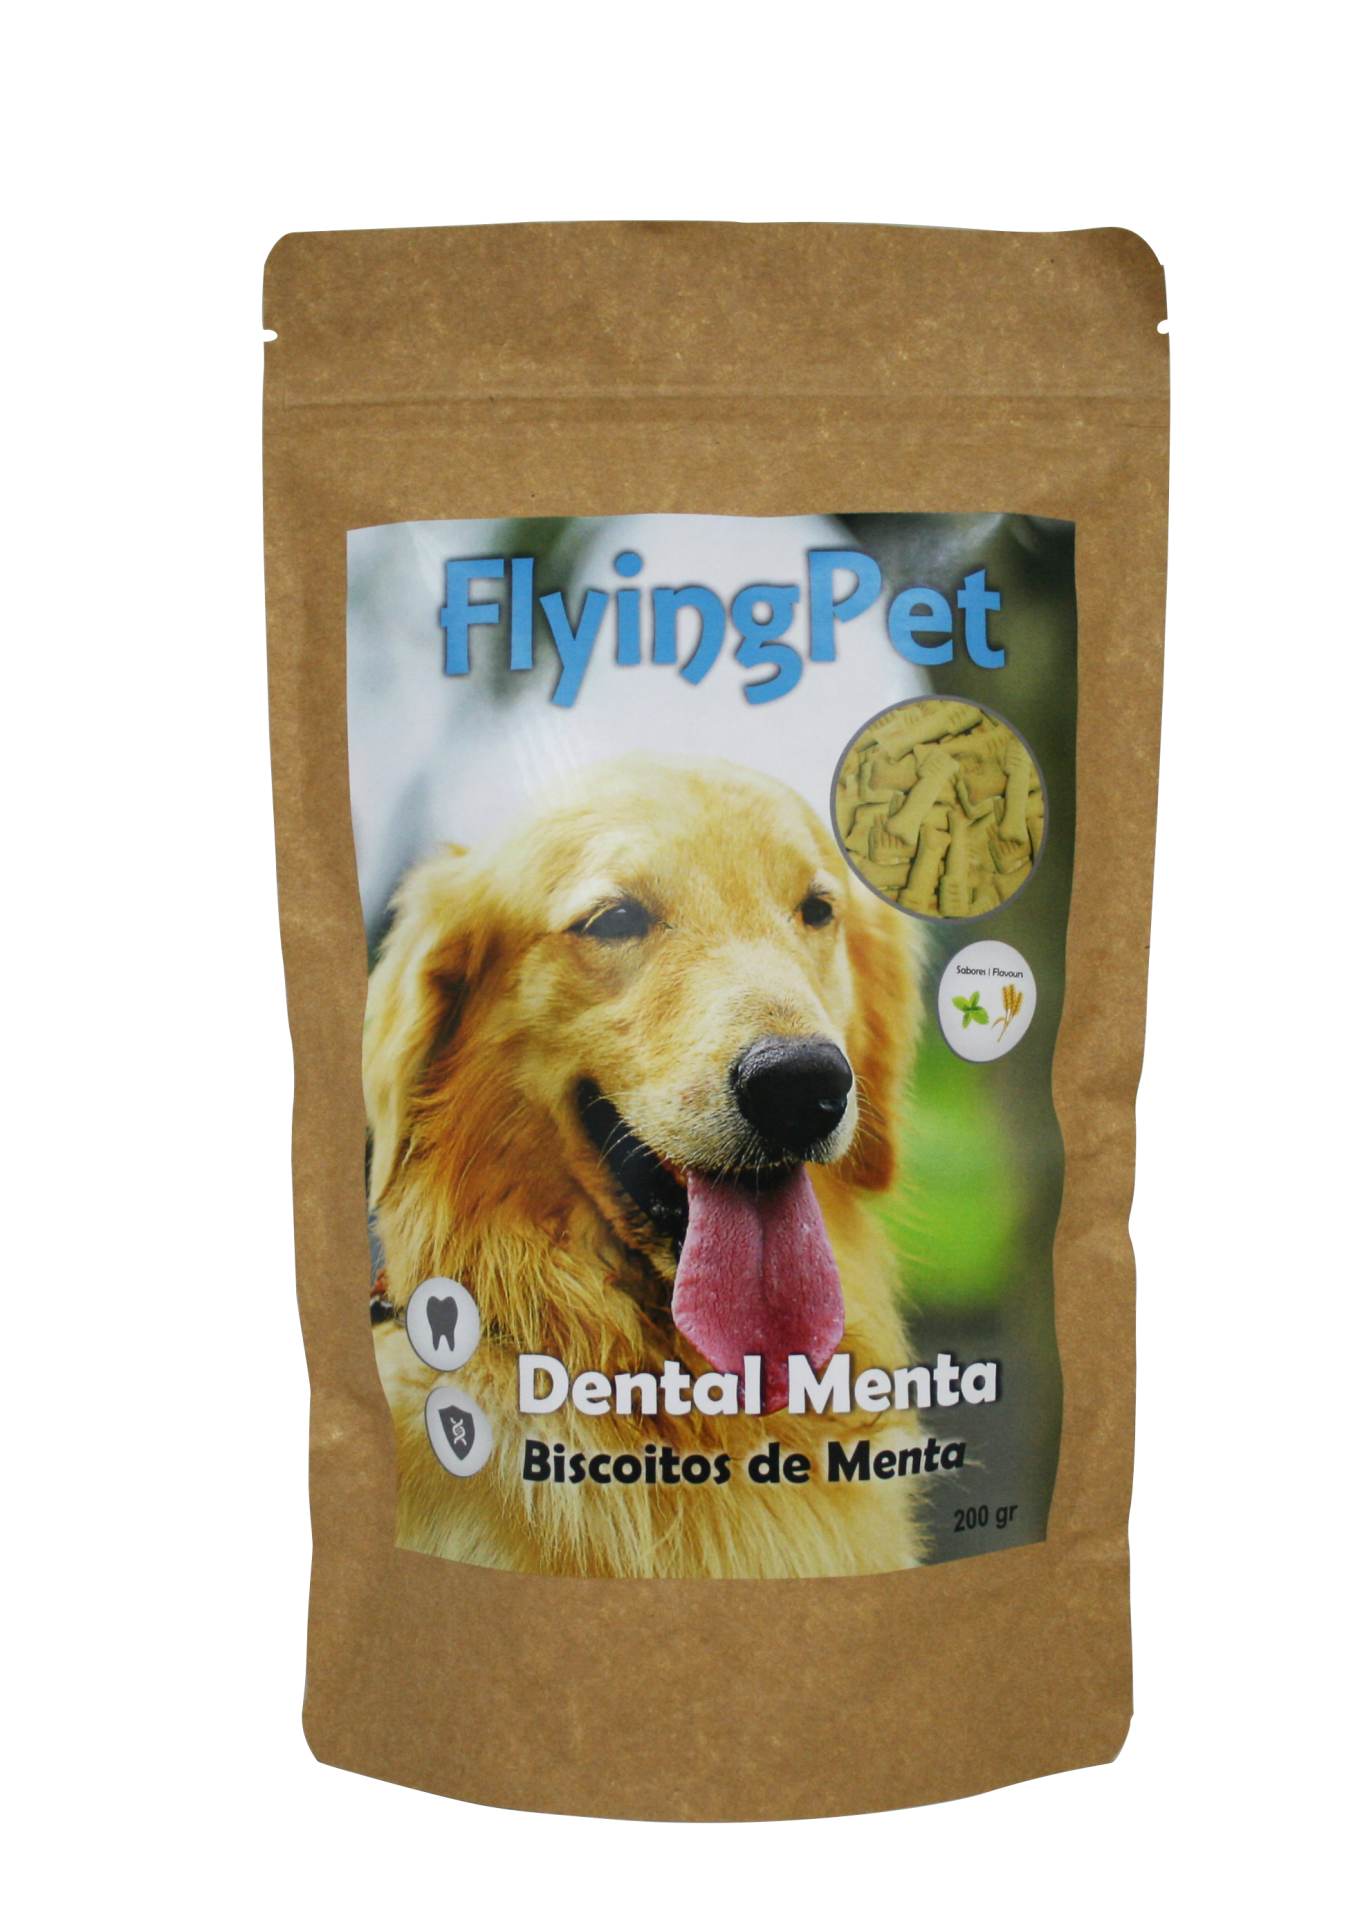 Biscoitos de Menta - Dental Mint (200 g)